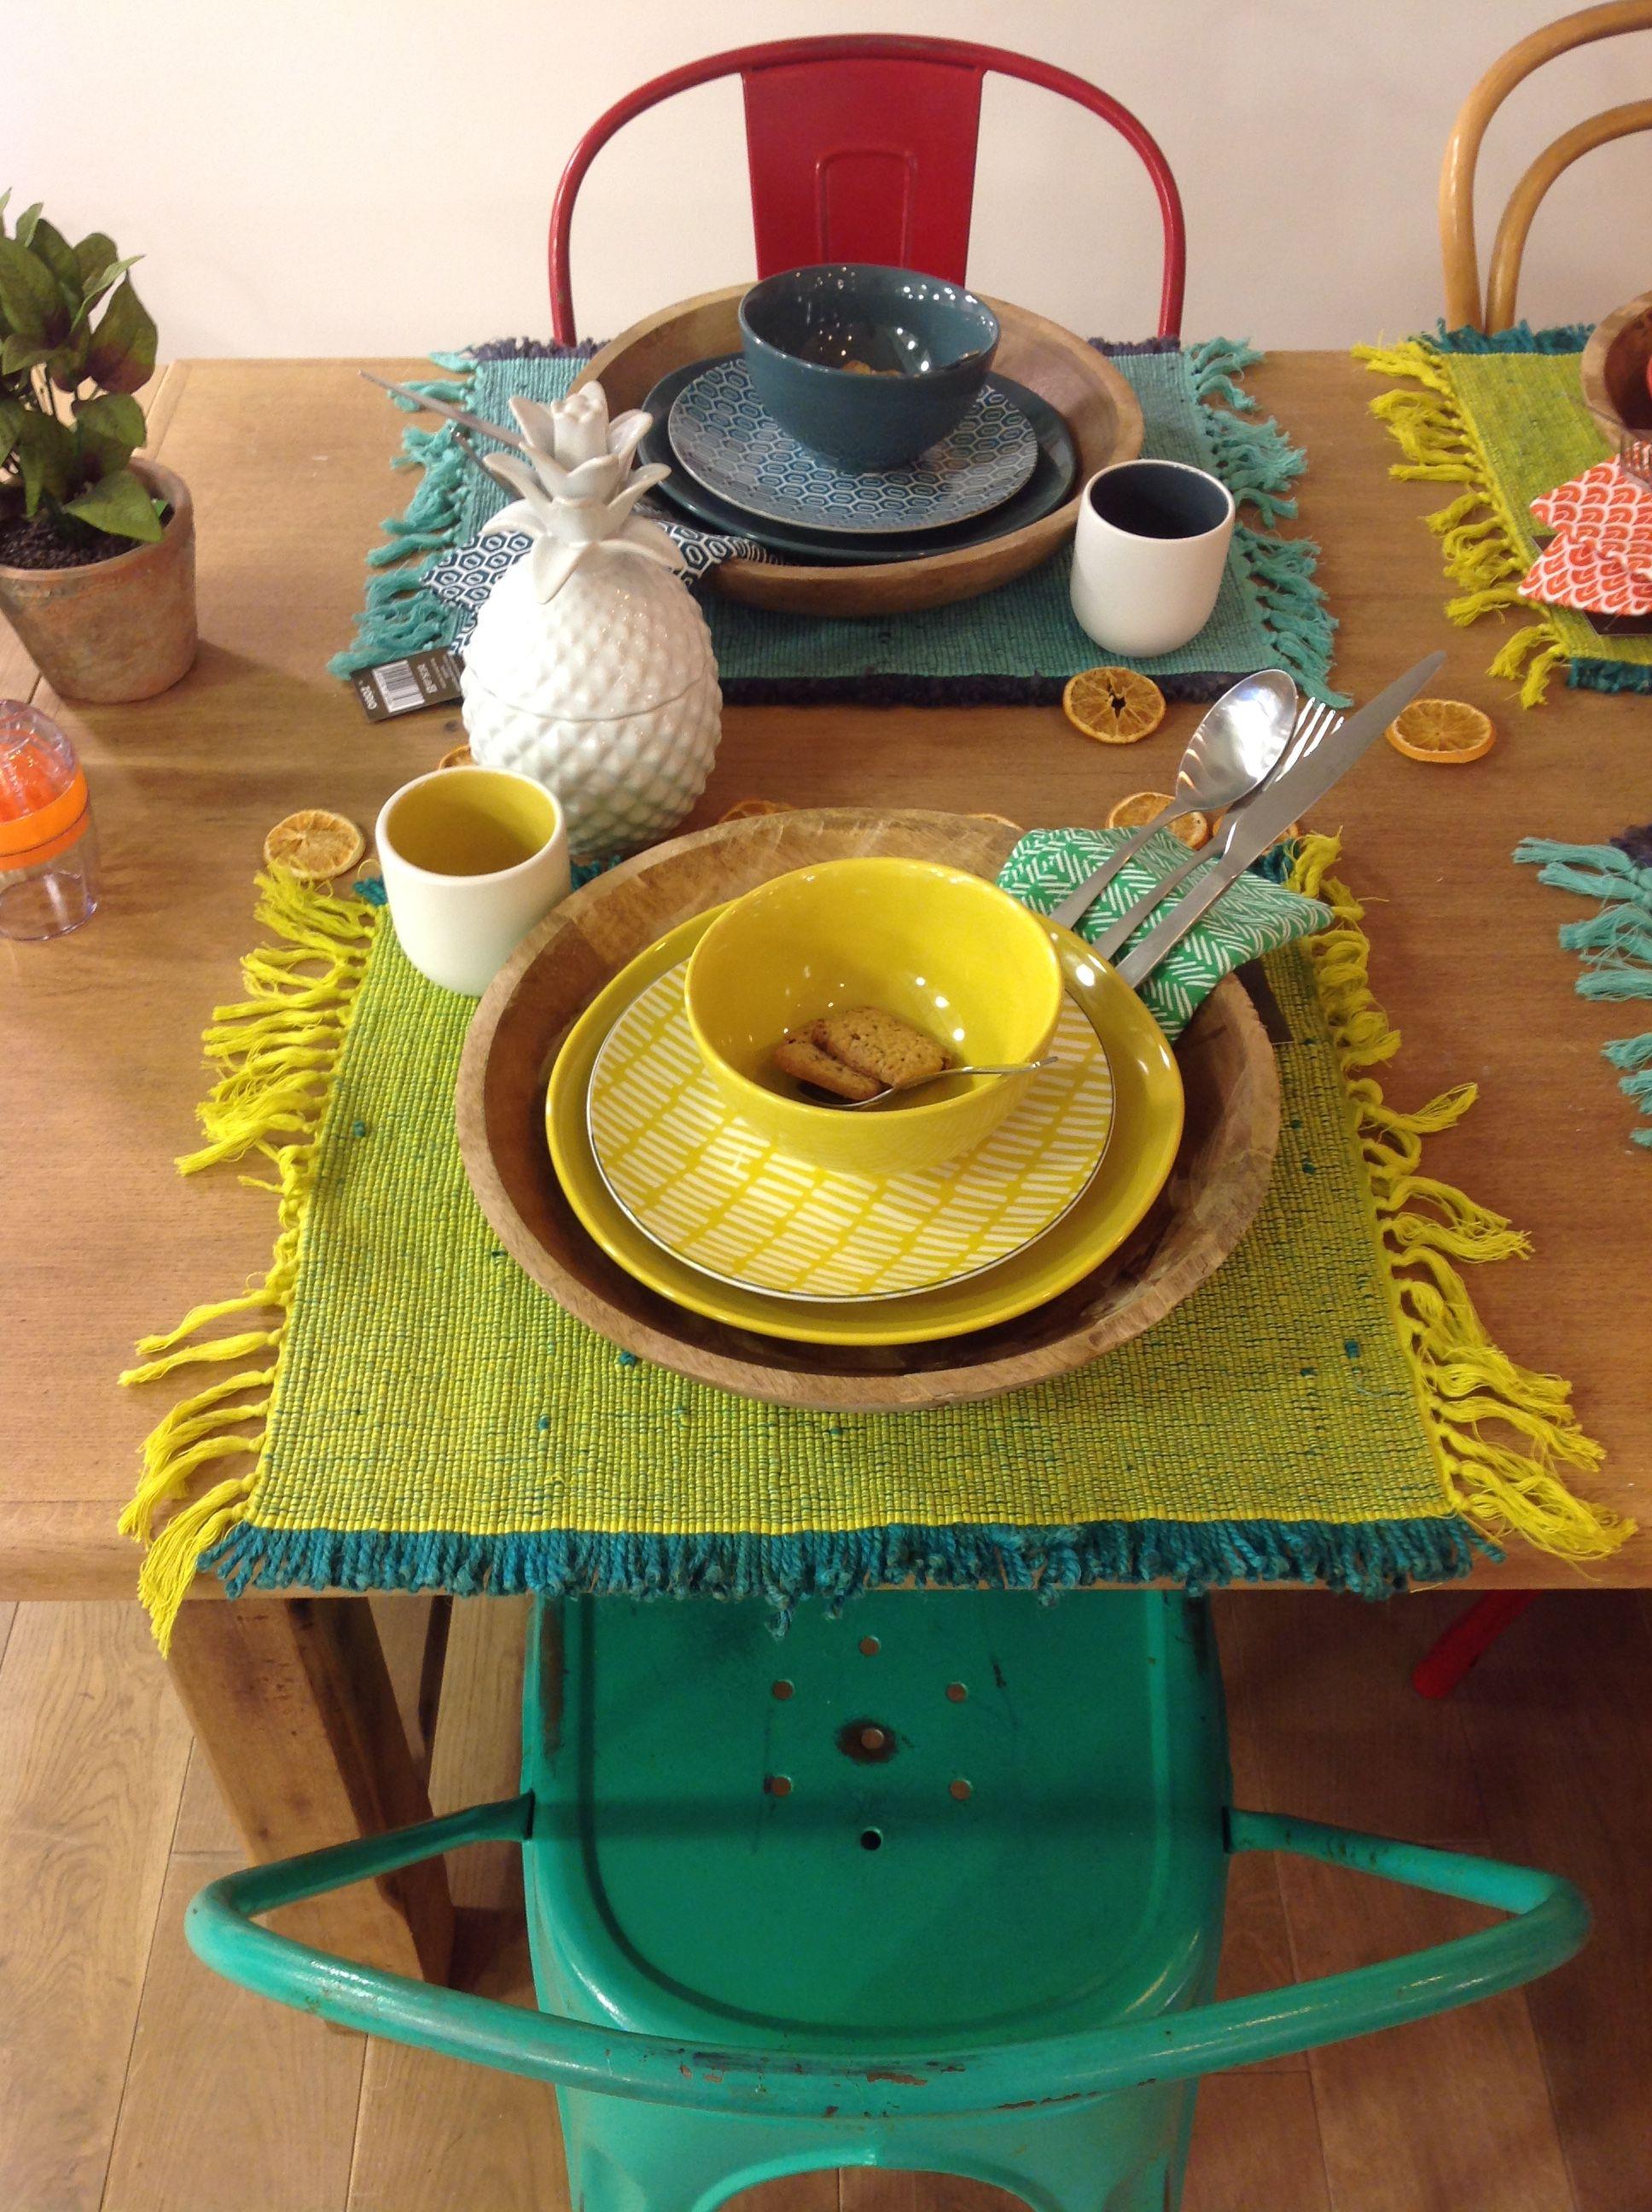 Salon Herblay Declic Vacances Nomades Deco Table Deco Objets